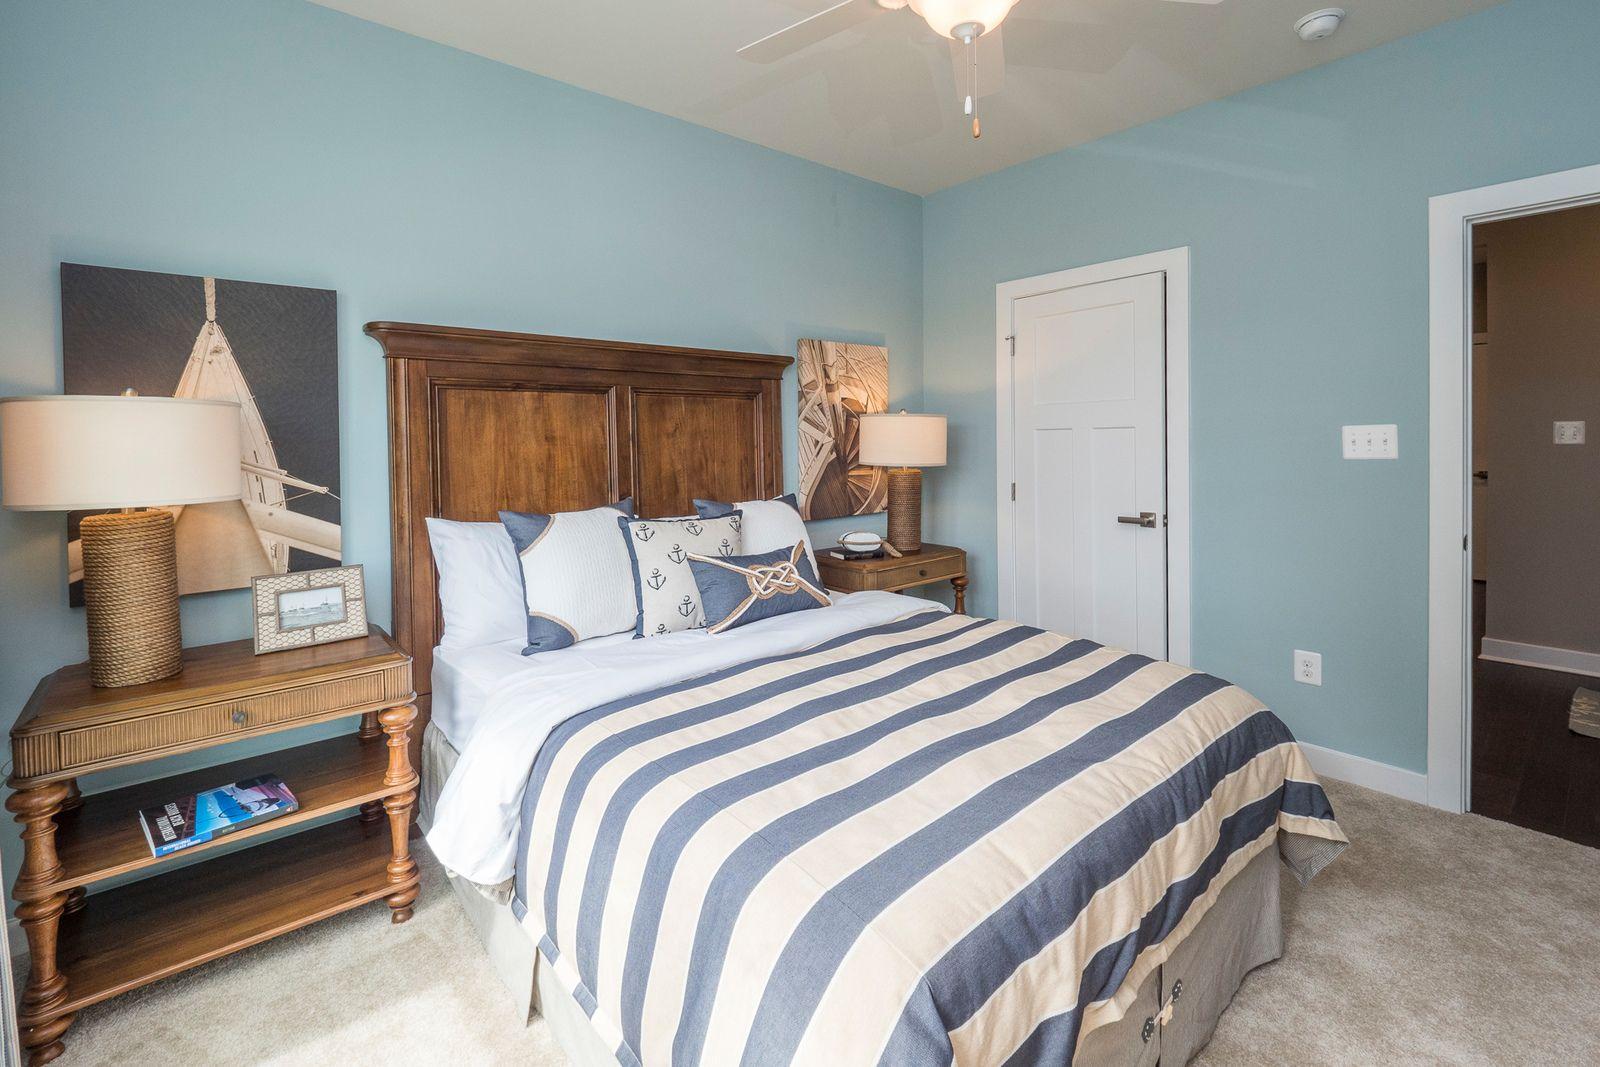 Bedroom featured in the Palladio By Ryan Homes in Warren County, NJ